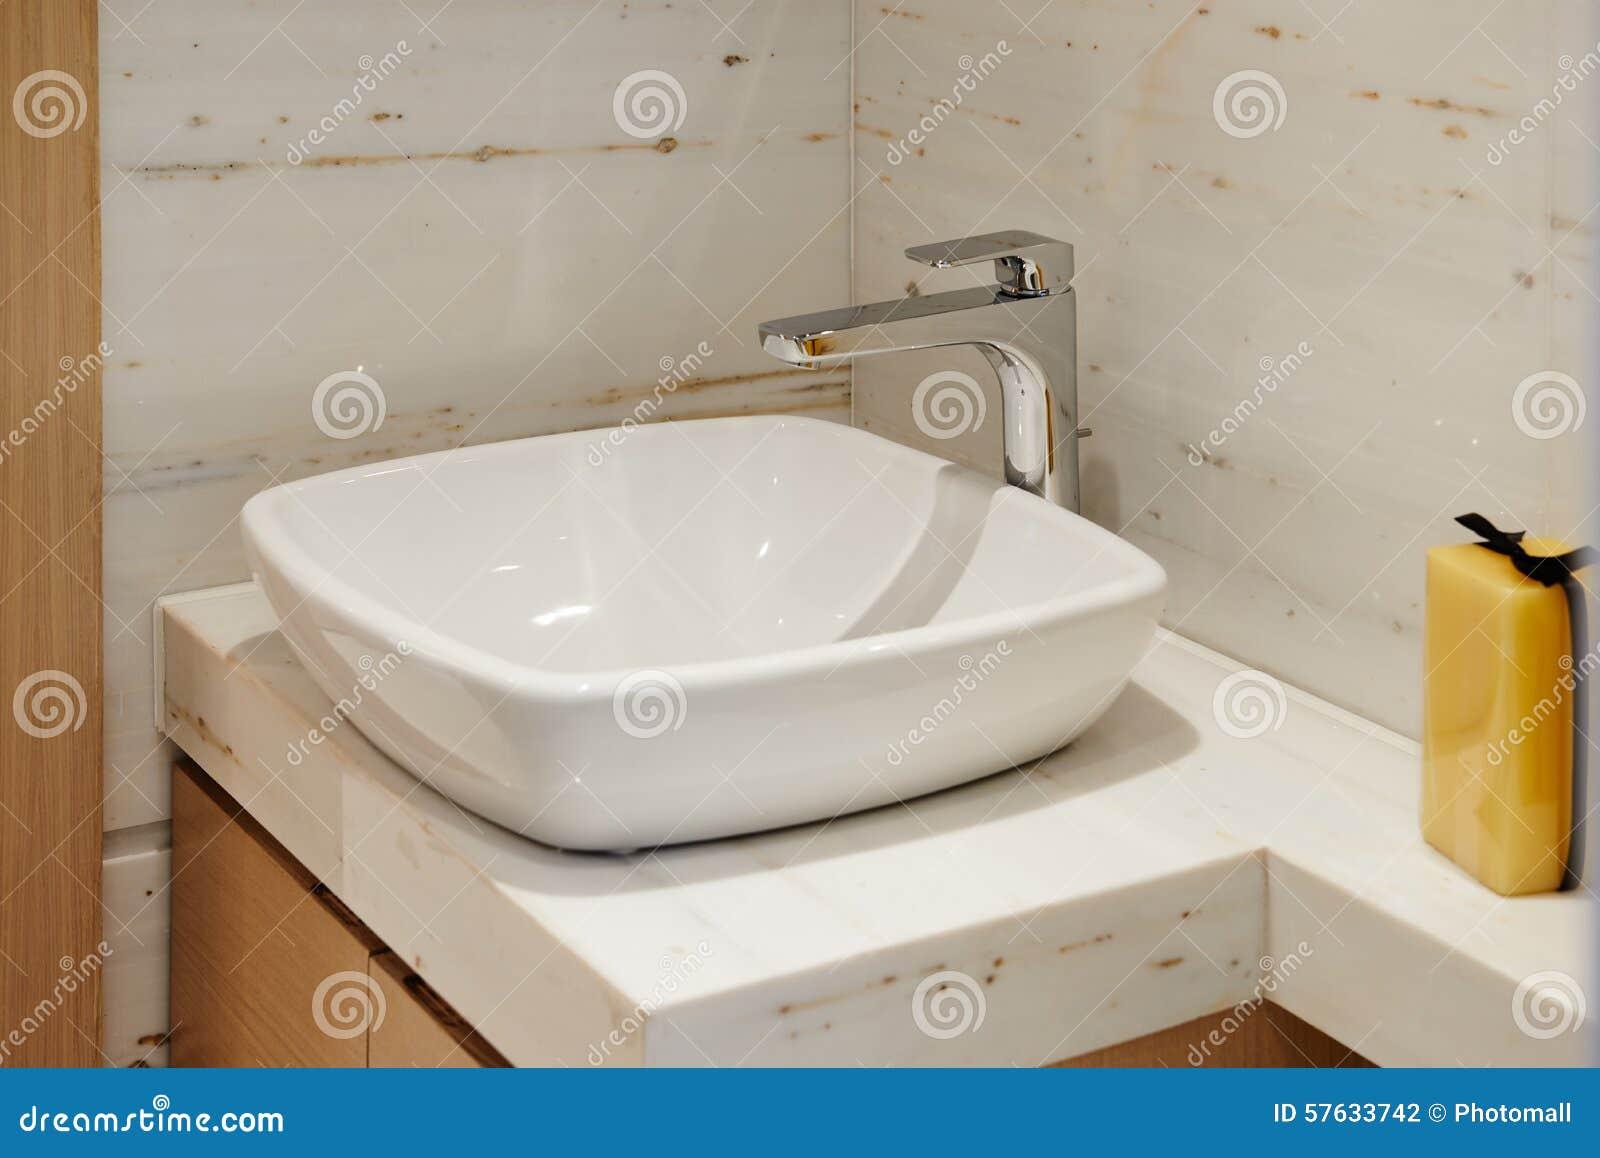 Fuchs im lavabo gefunden fm today